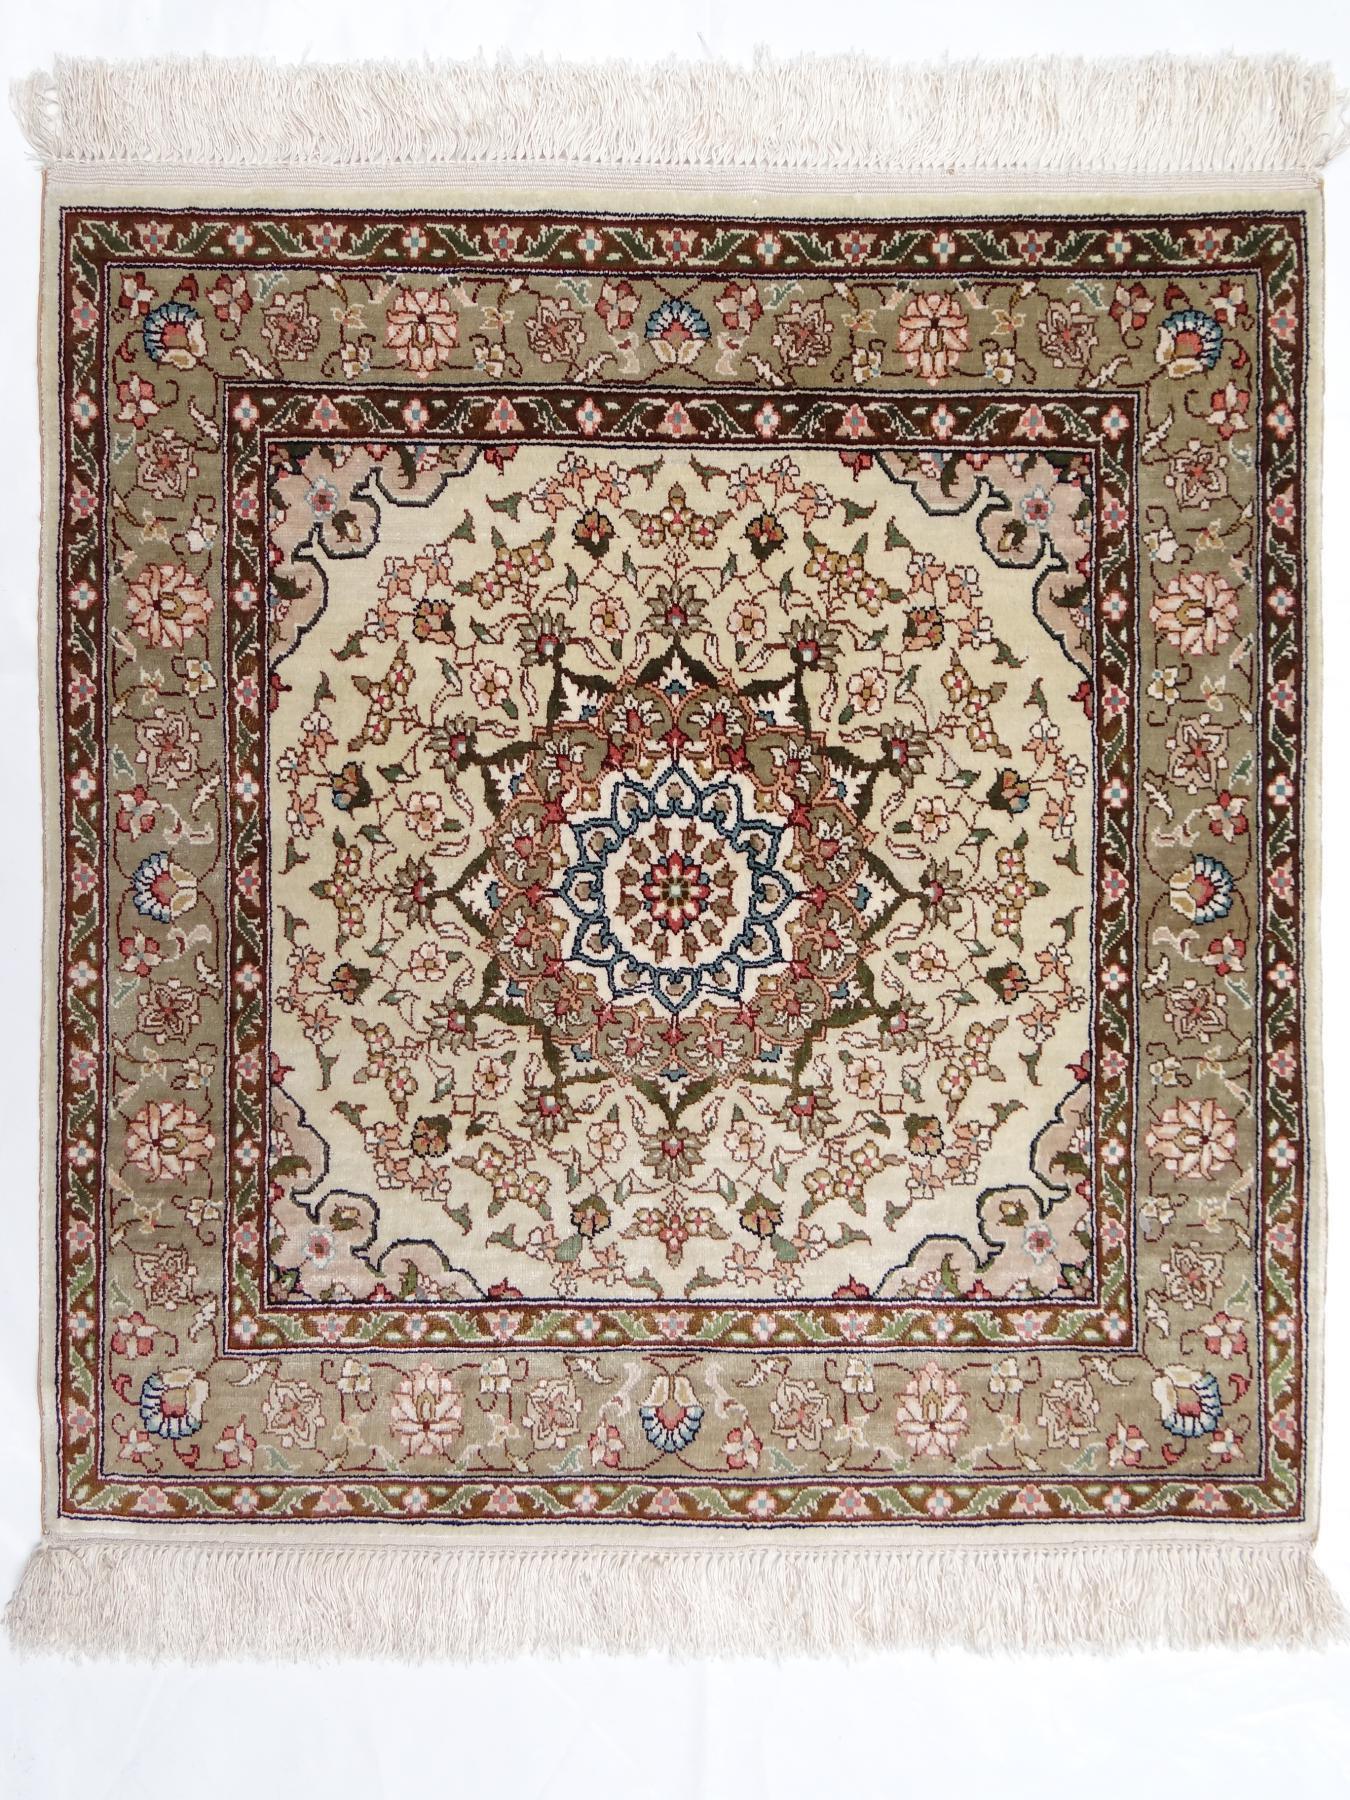 Turkestan Soie Tapis Prestigieux N 33149 62x60cm